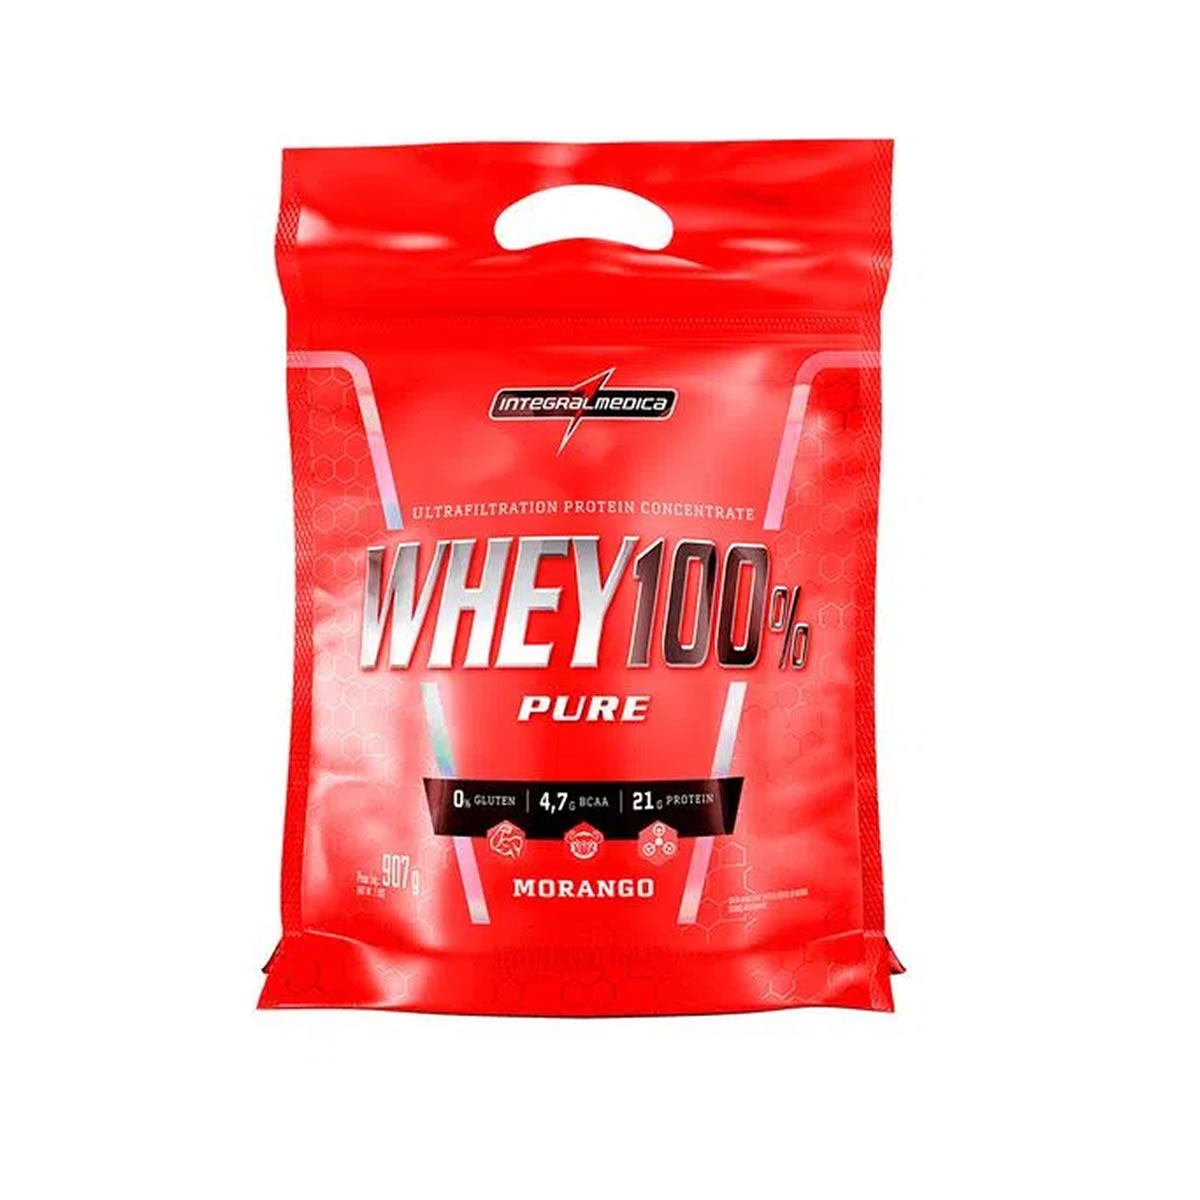 Whey 100% Pure sabor Morango 907g - Integralmedica